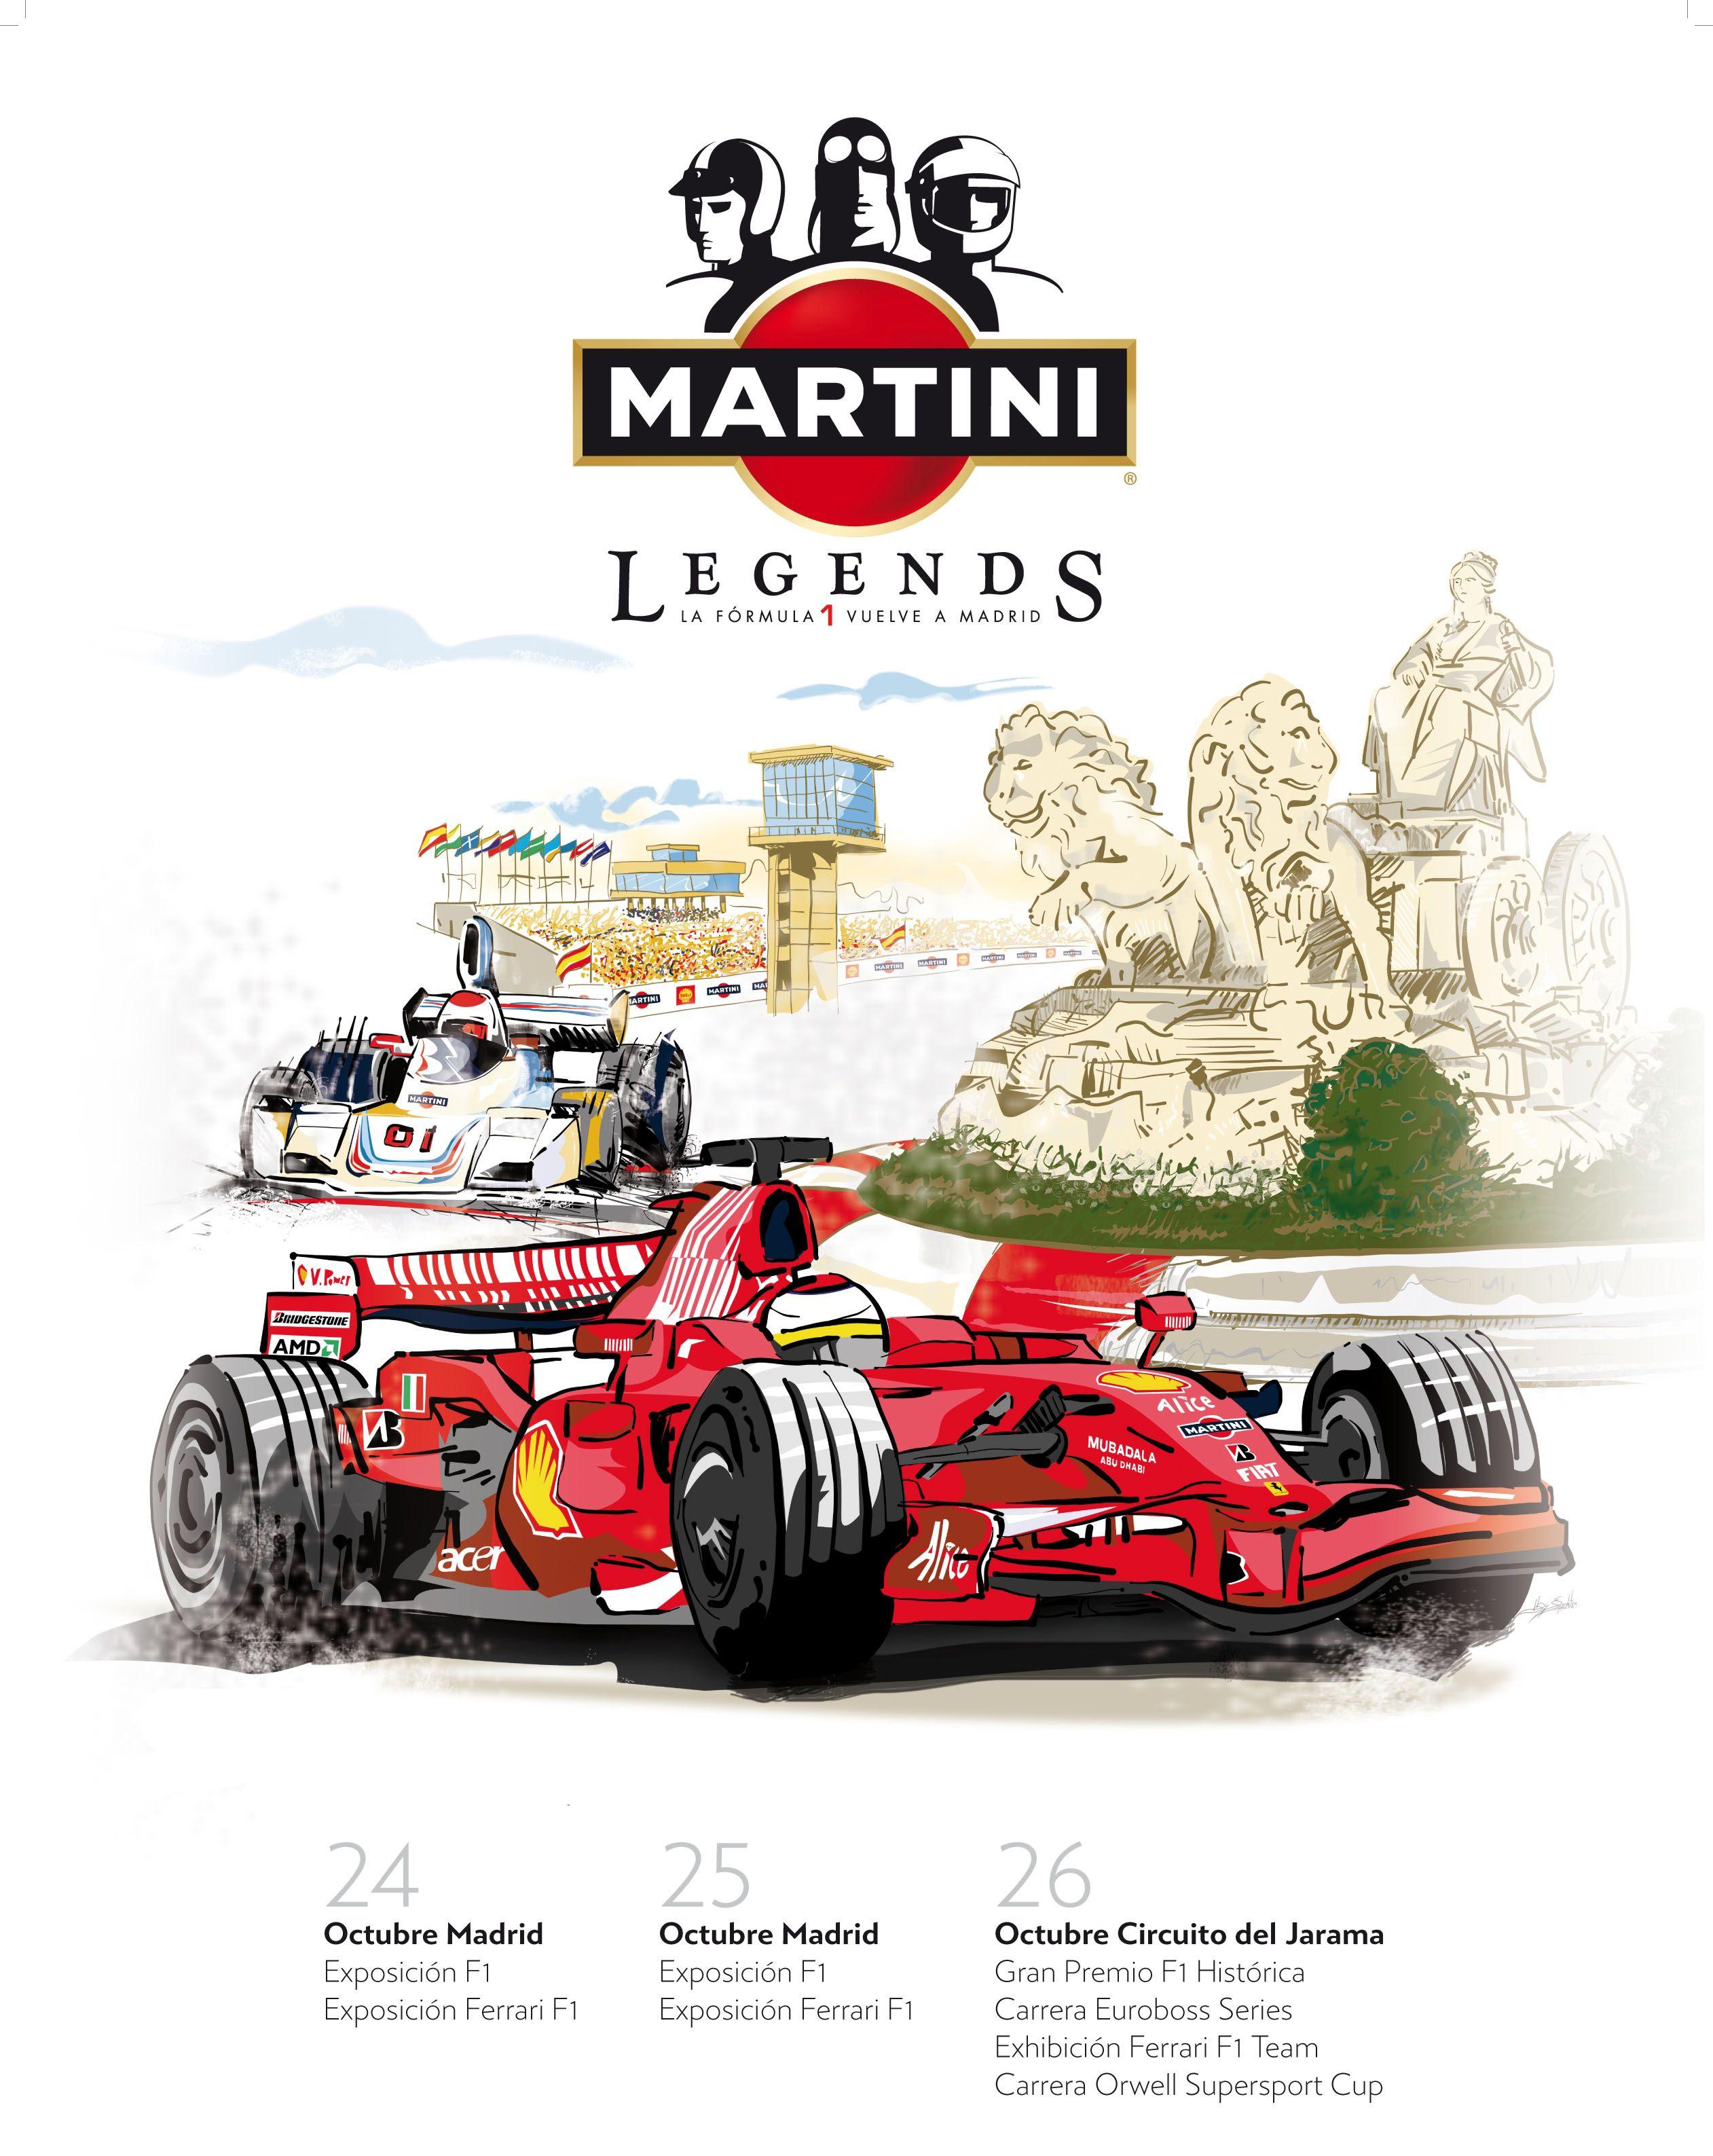 Martini Legends Motorsport Art Martini Race Cars